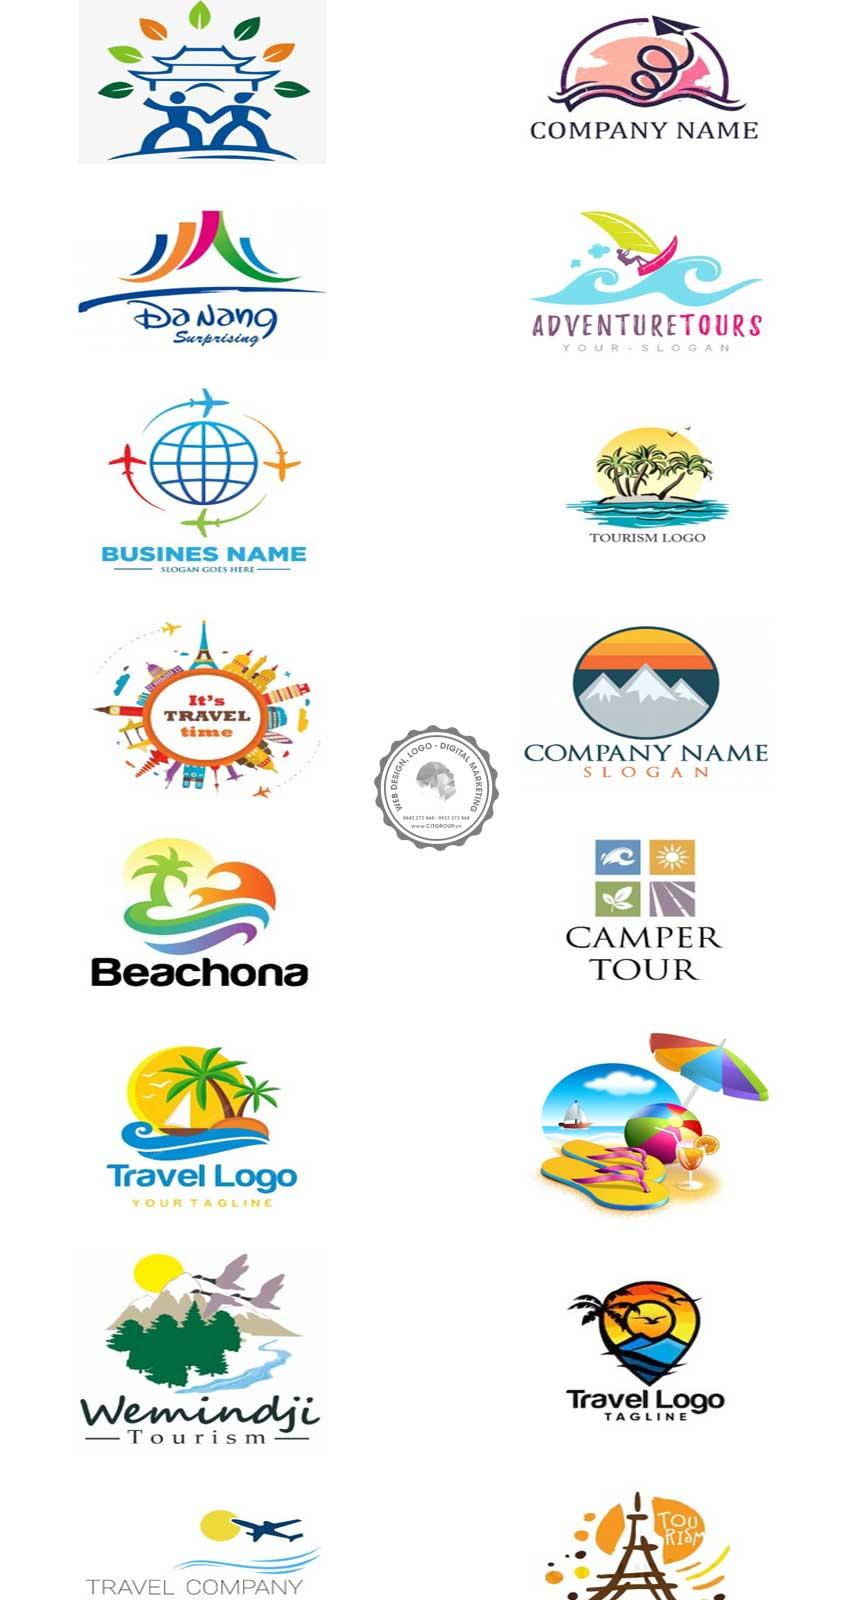 logo-doanh-nghiep